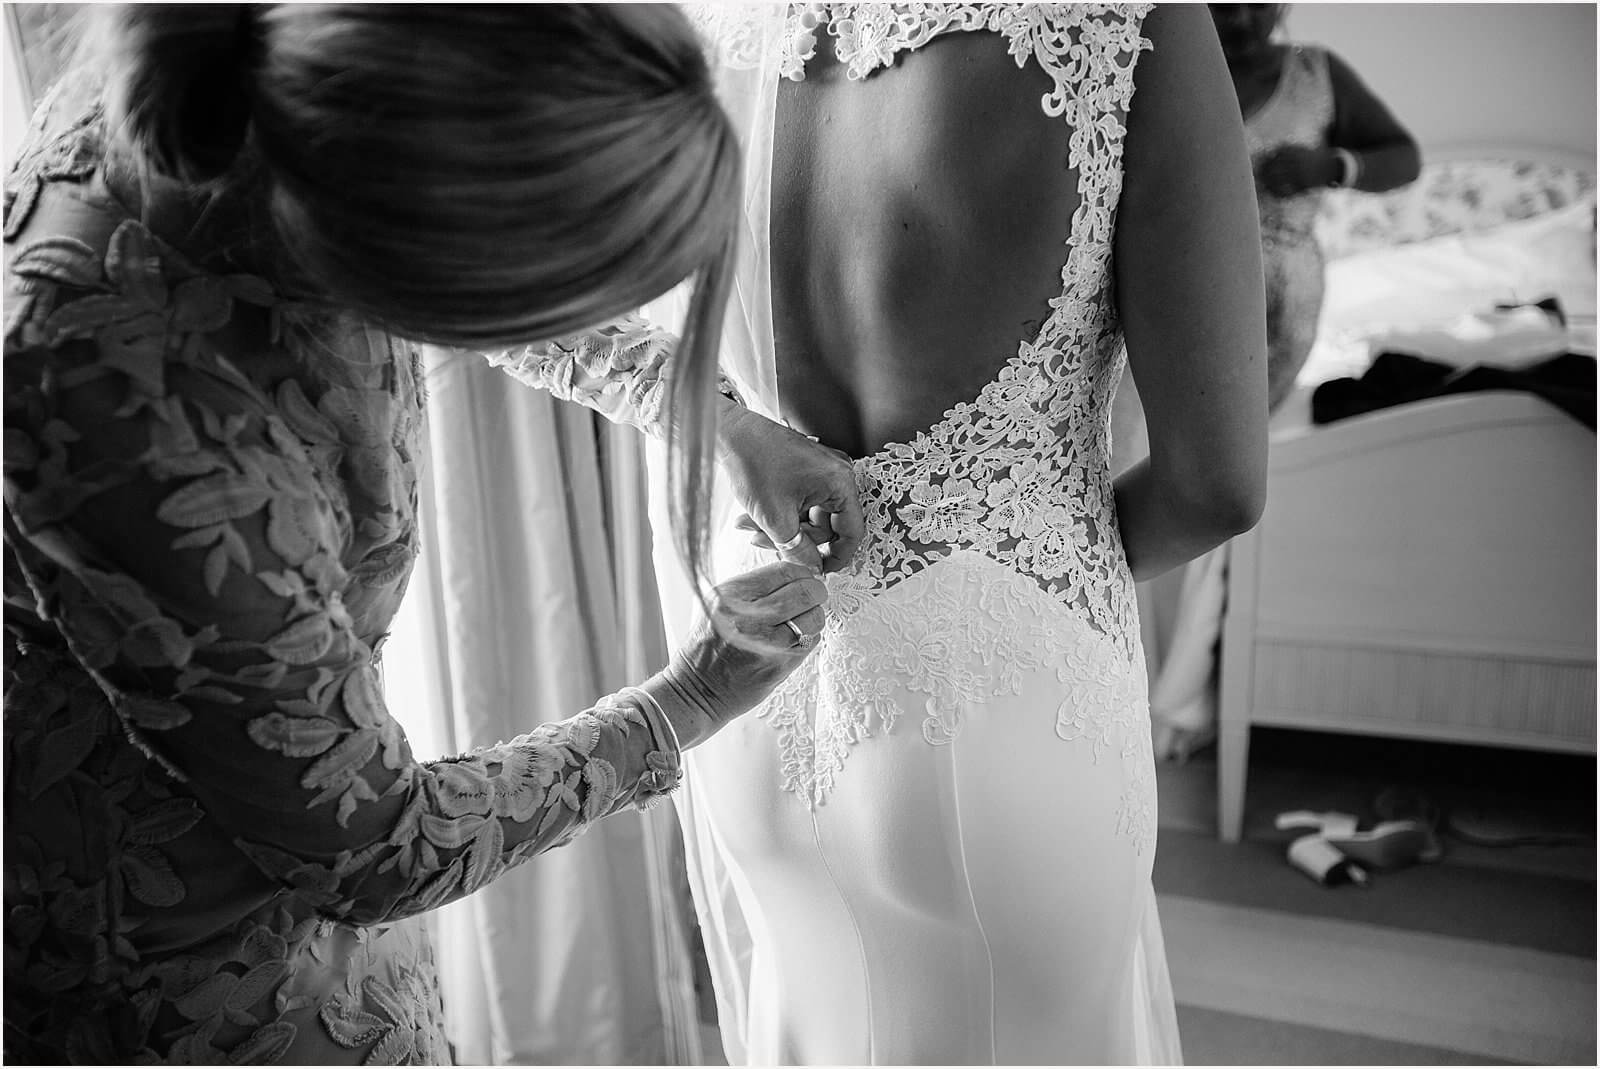 Chateau de Courtomer Wedding | Chantel & Evan 21